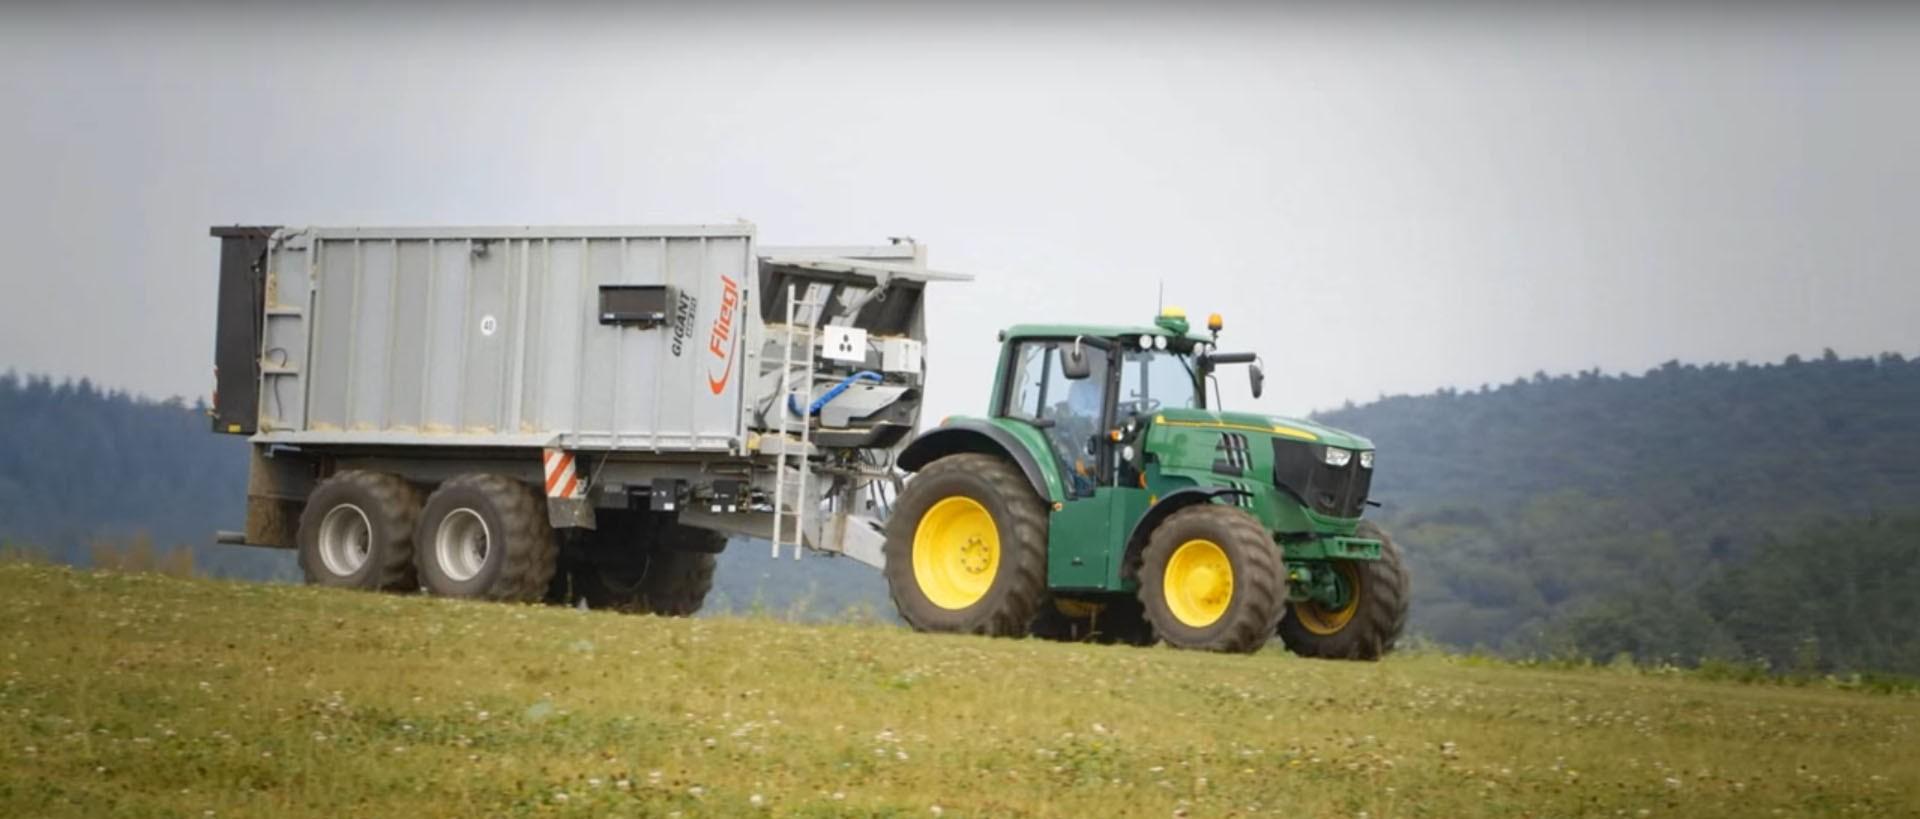 John Deere Reveals 180 HP Battery-Powered Tractor for 2016 ...